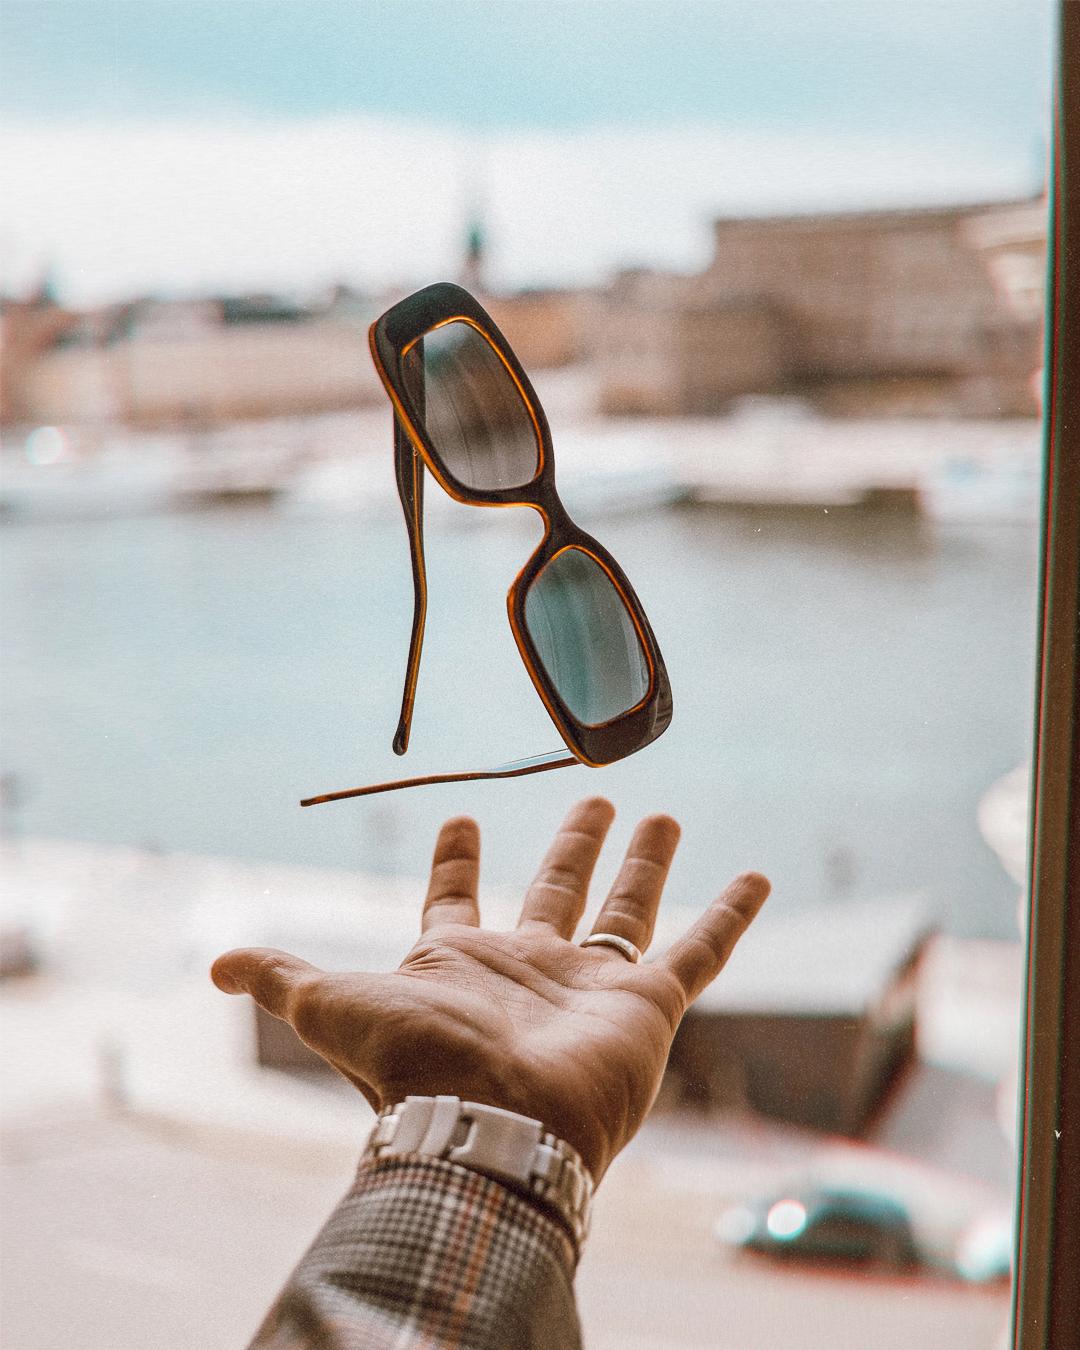 ◎ Sunglasses from Komono